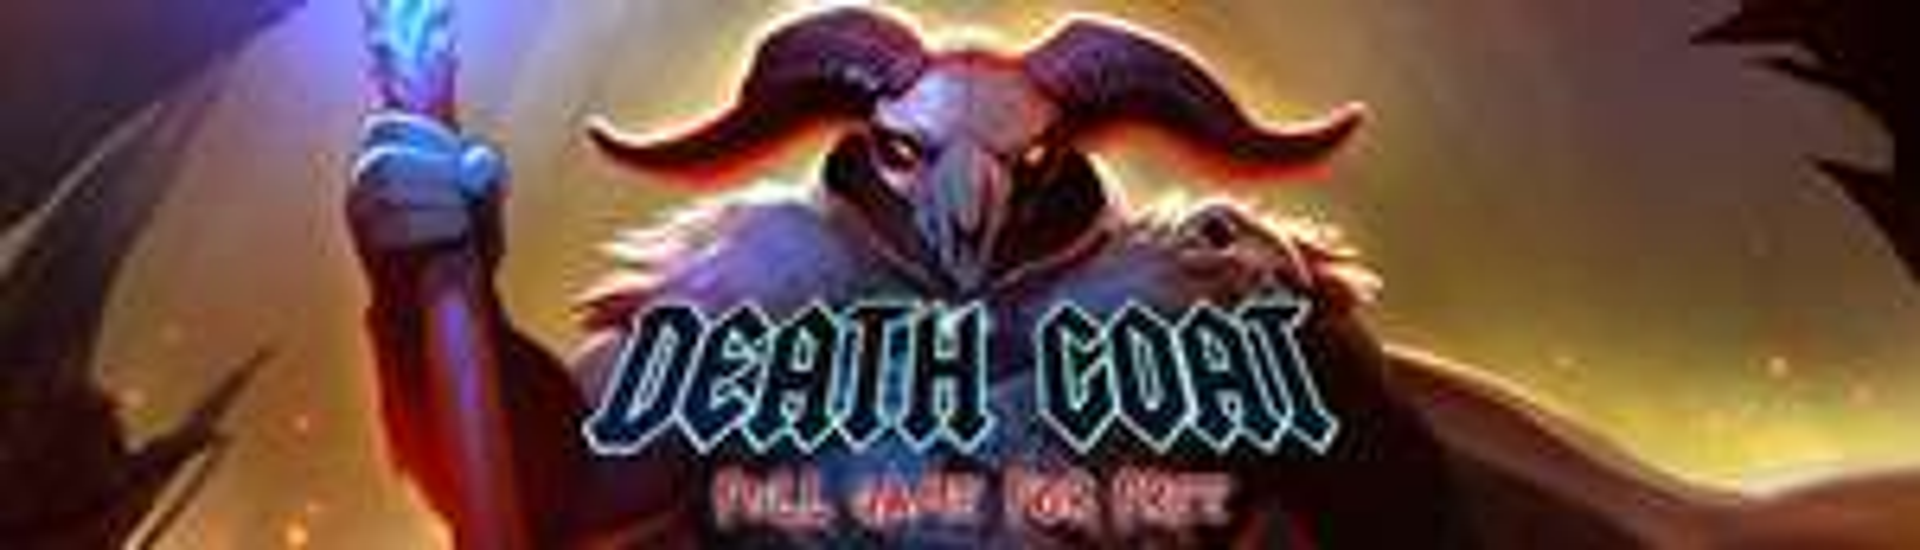 Gratis game Death Goat @Indiegala